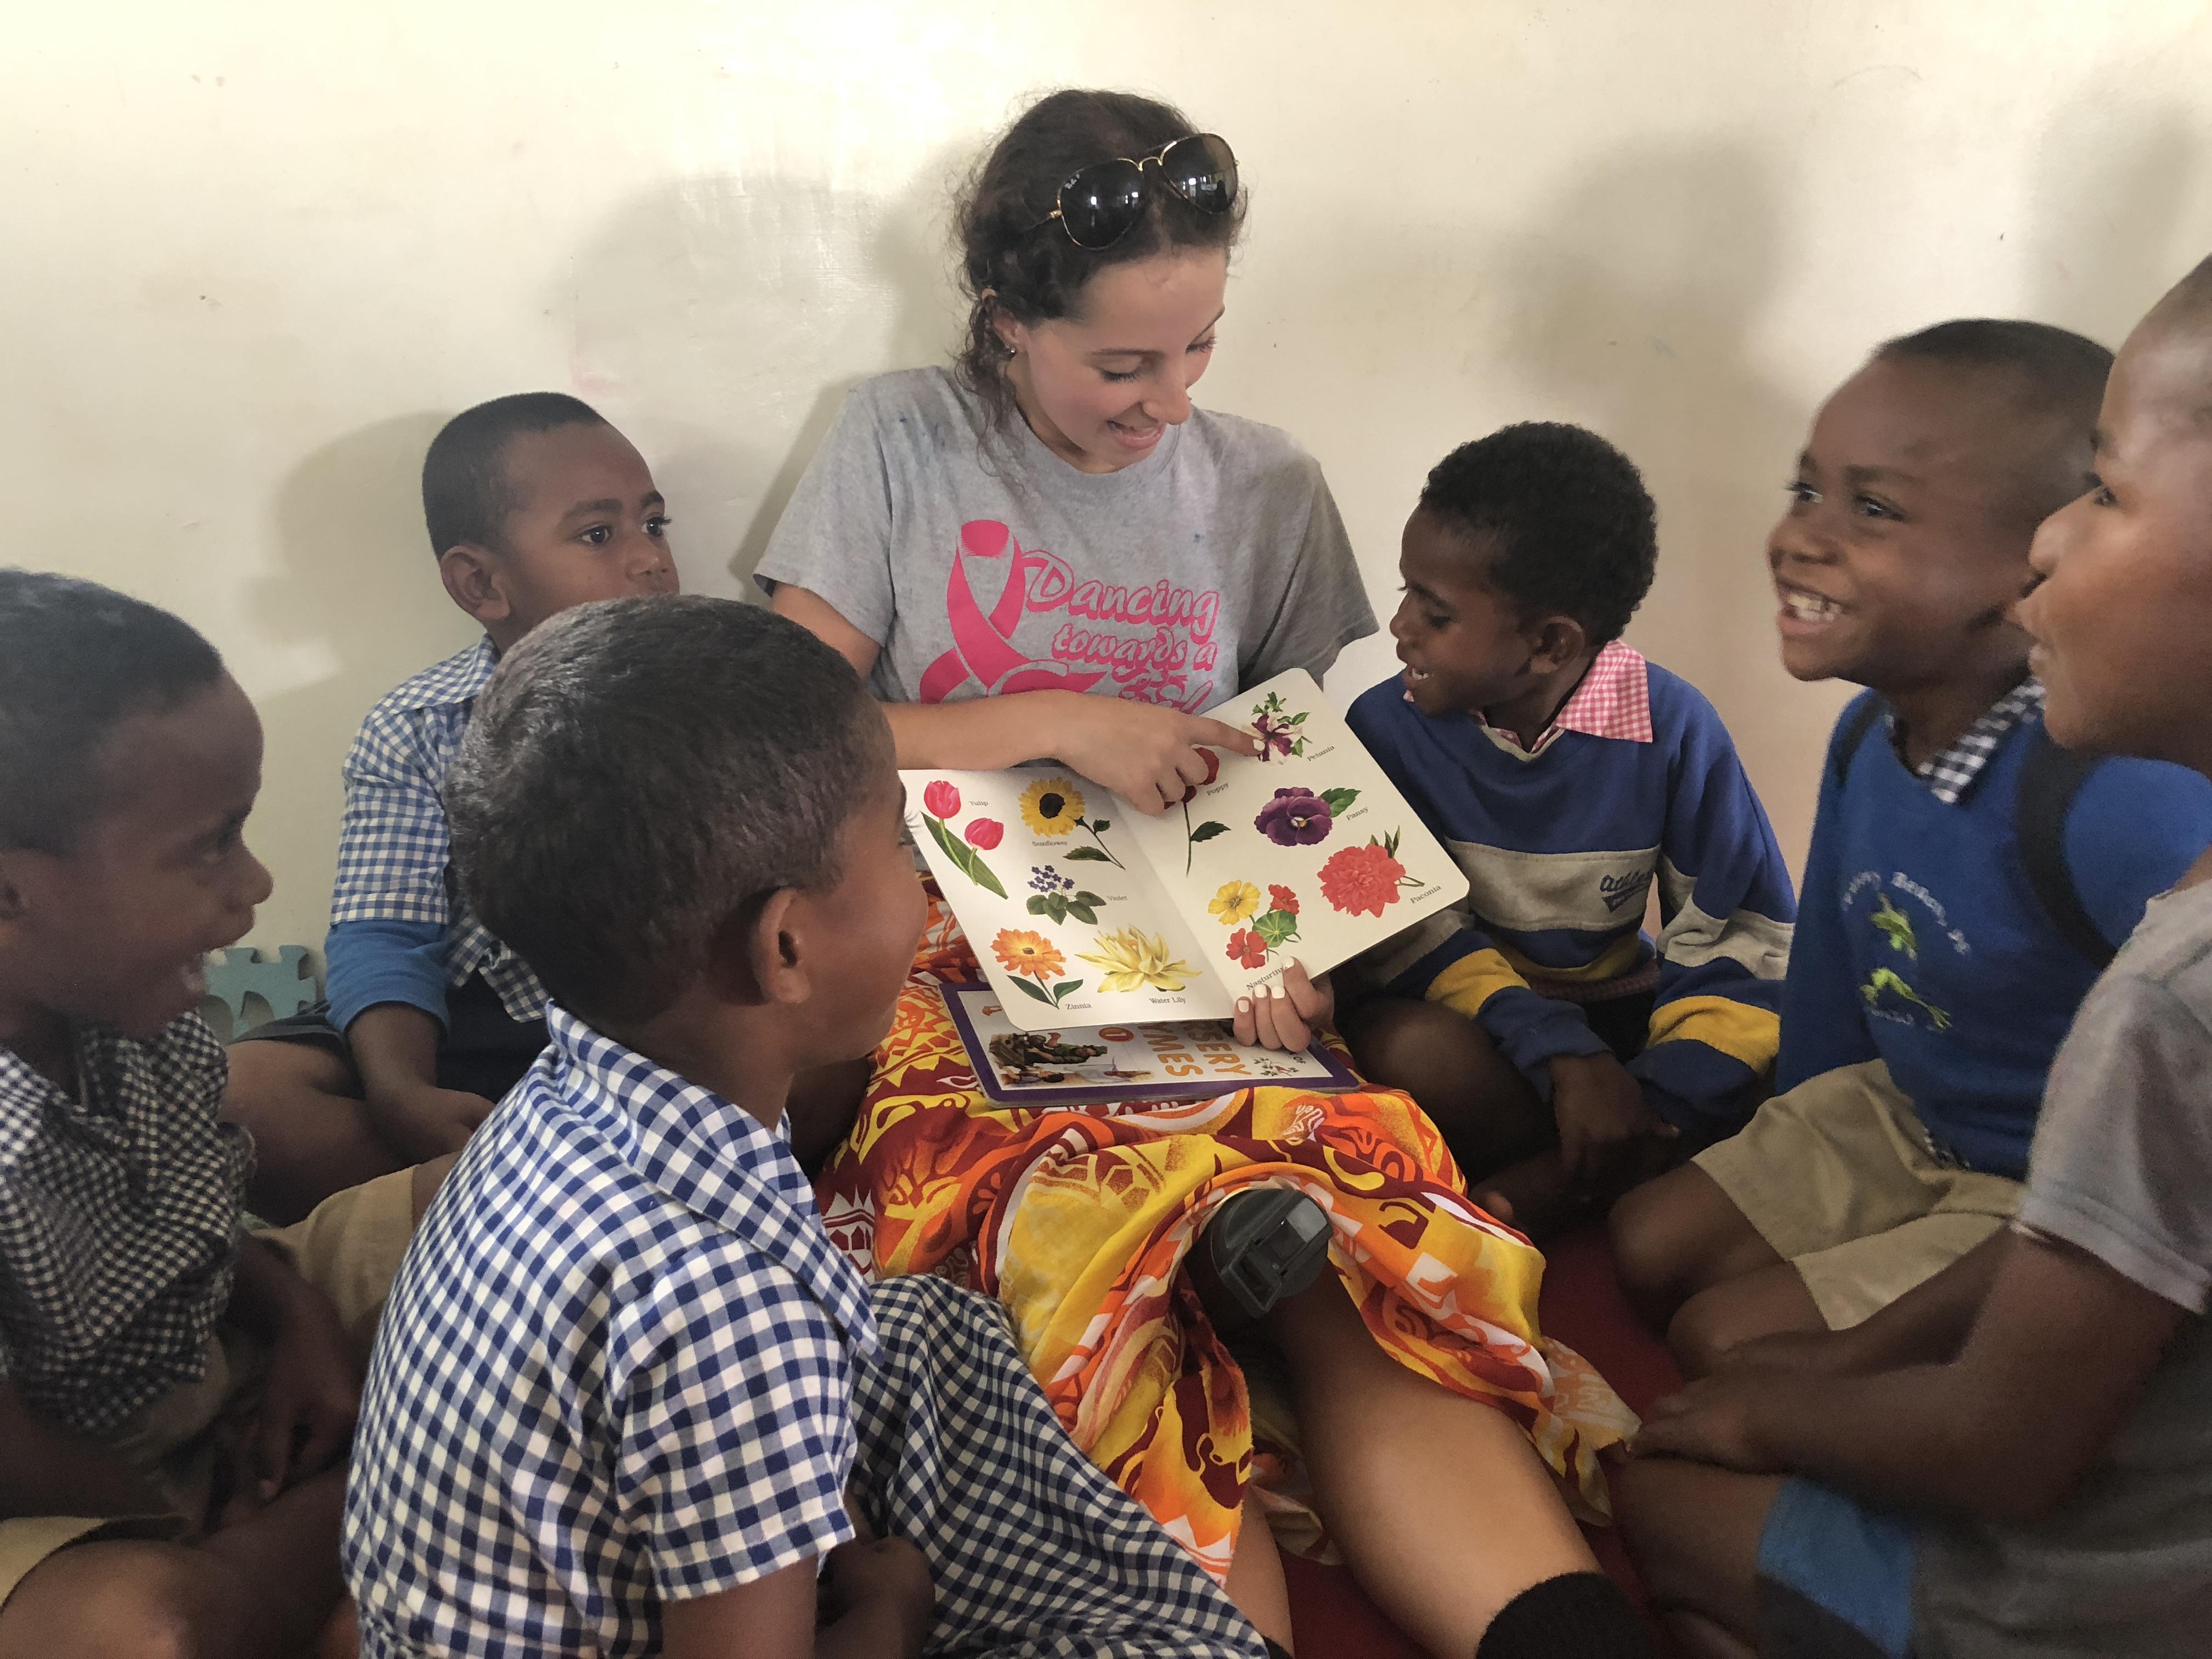 Summer Program - Cultural Organizations | Global Works - Fiji Islands: Building Community